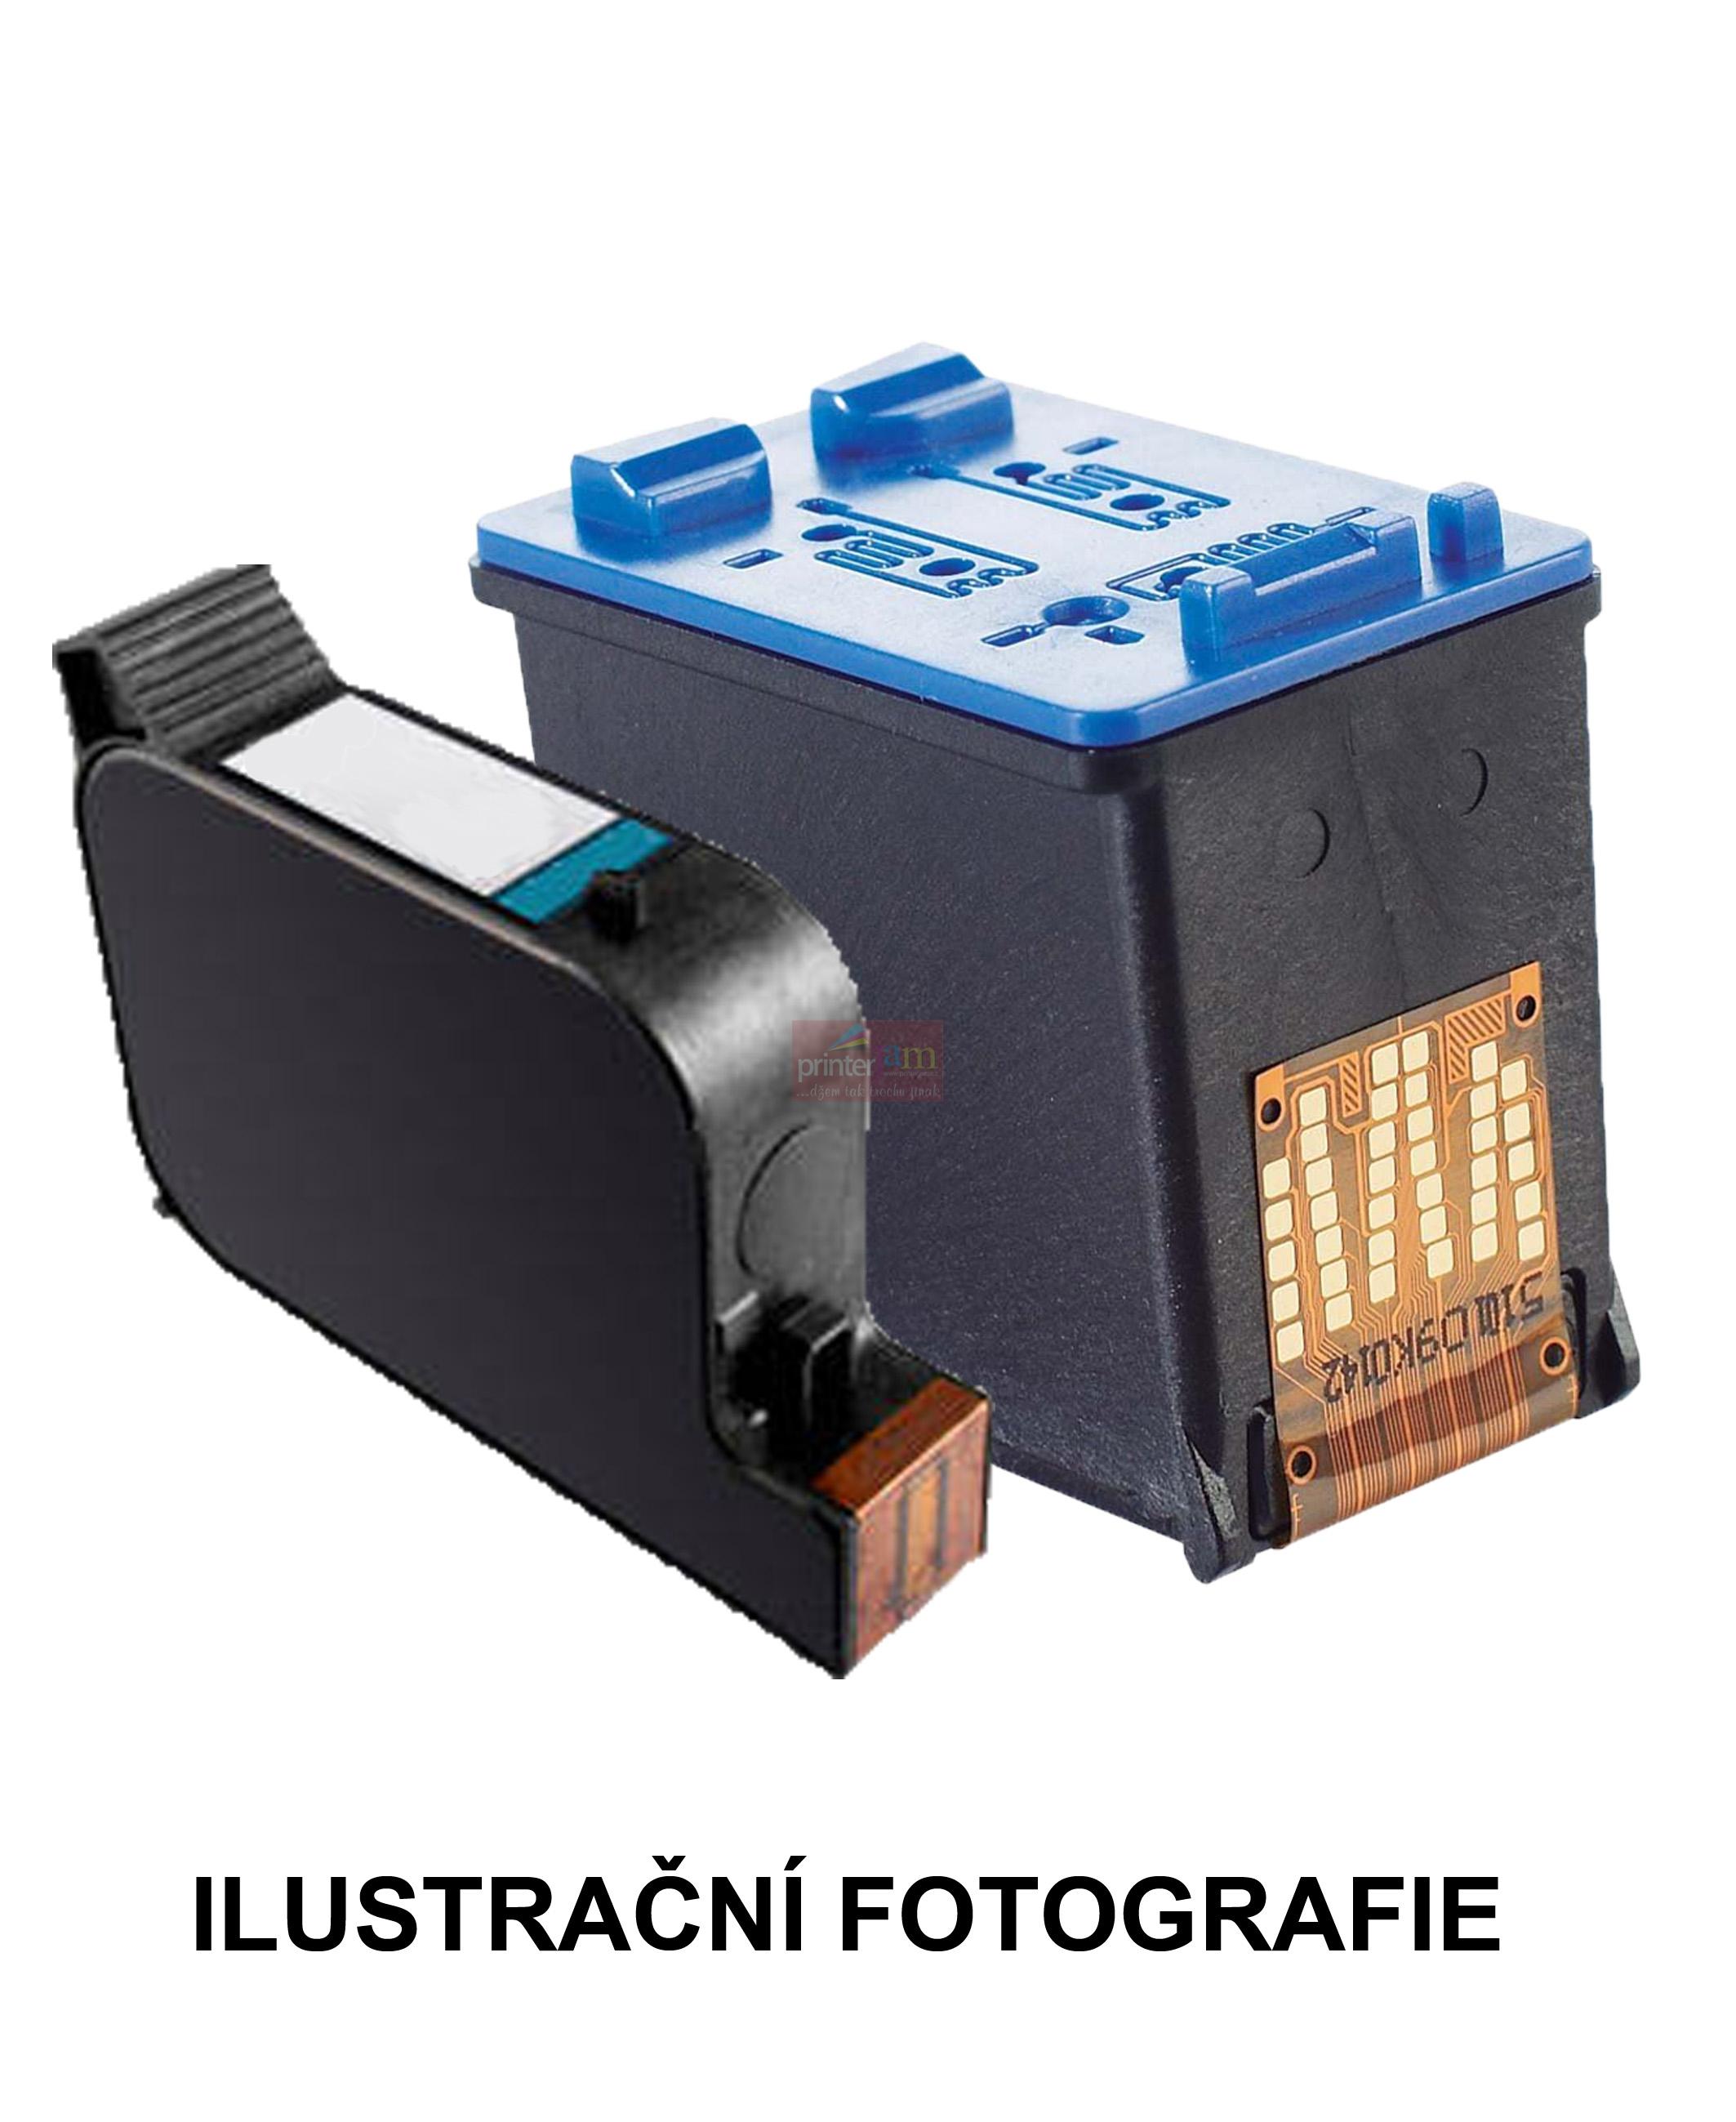 ink-jet pro Canon iP4850 cyan, 9 ml, originál